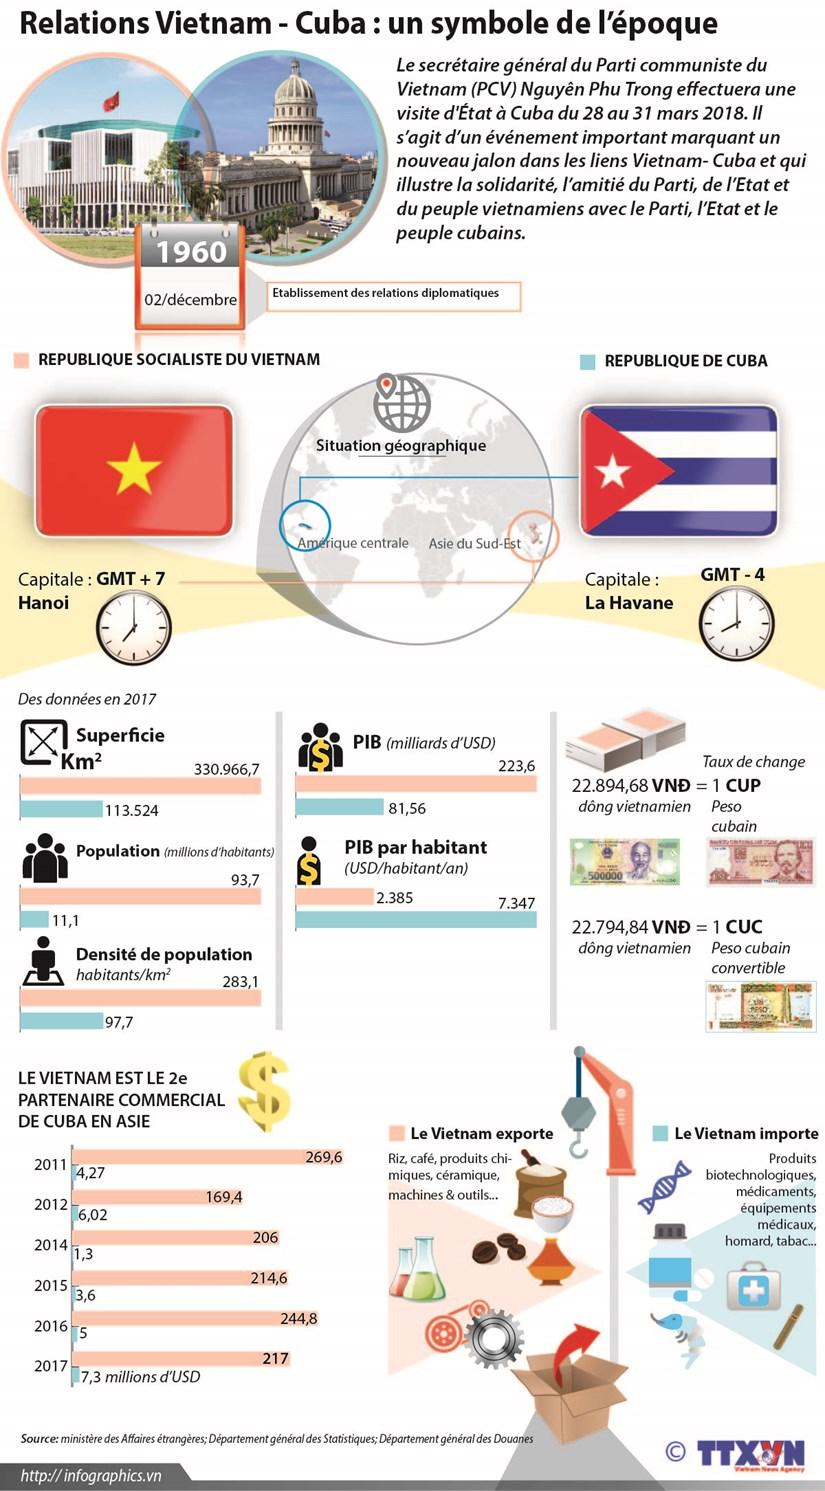 Relations Vietnam - Cuba : un symbole de l'epoque hinh anh 1